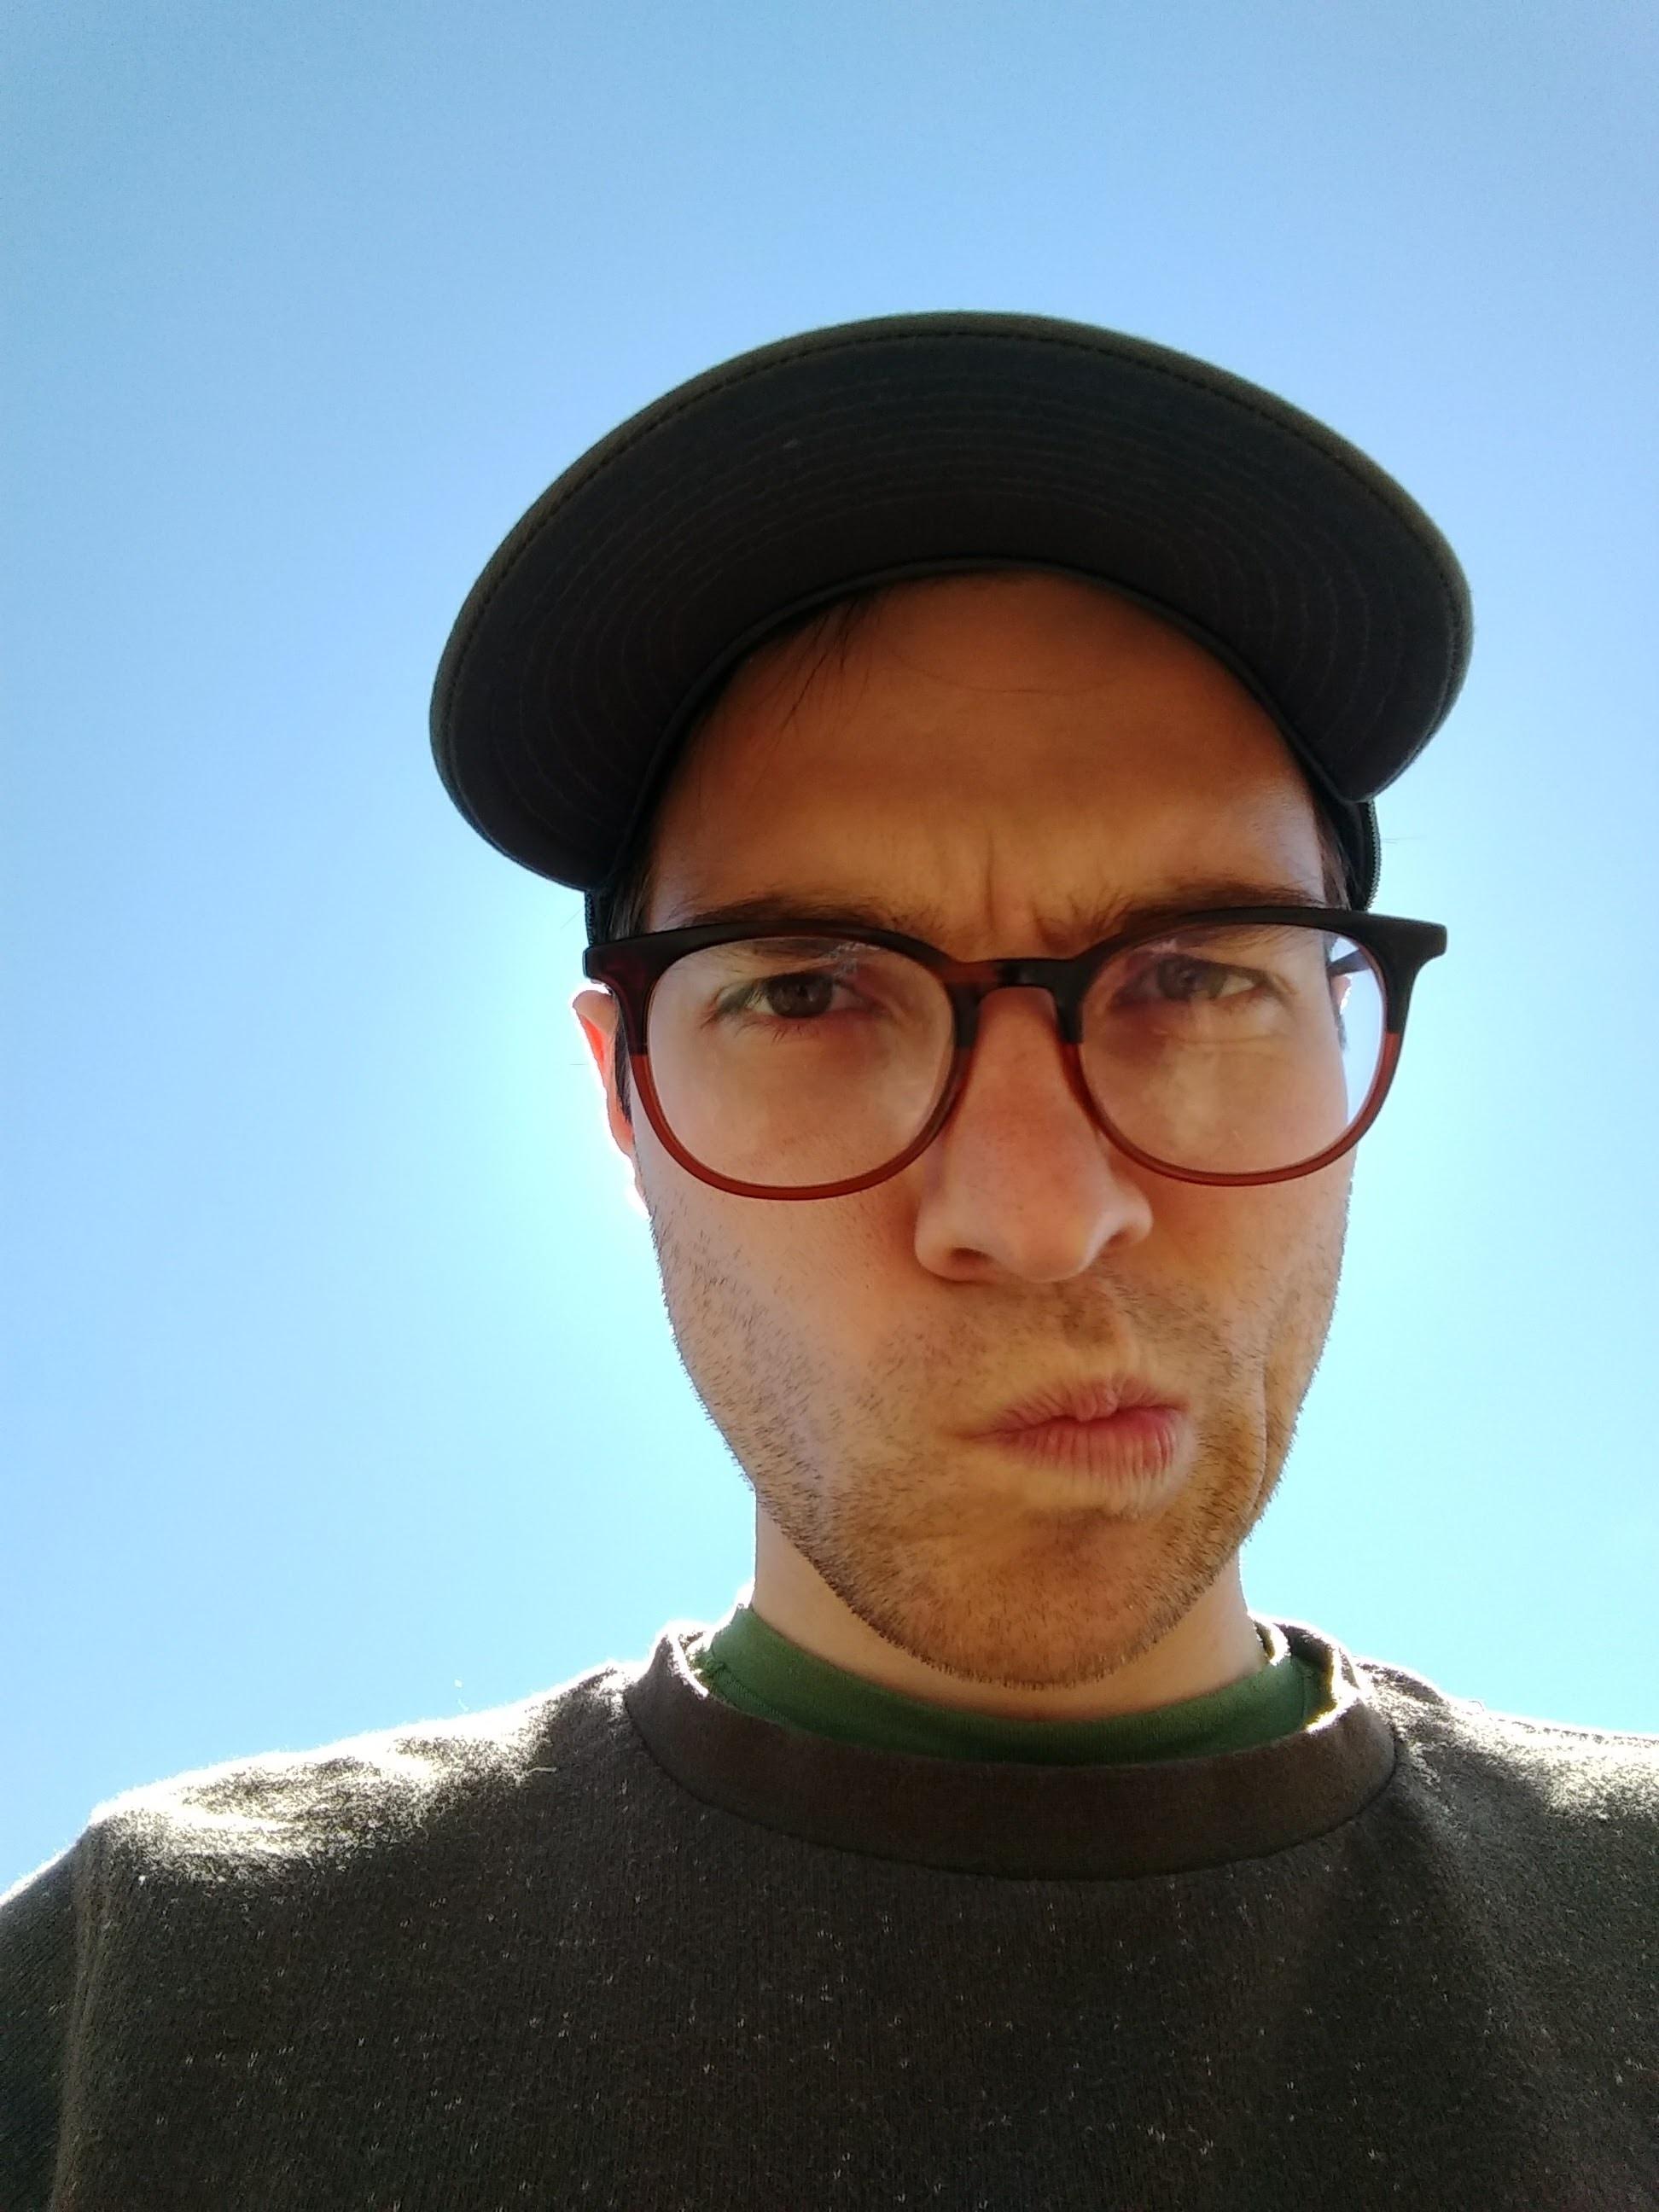 Avatar of user Robbie De Vries